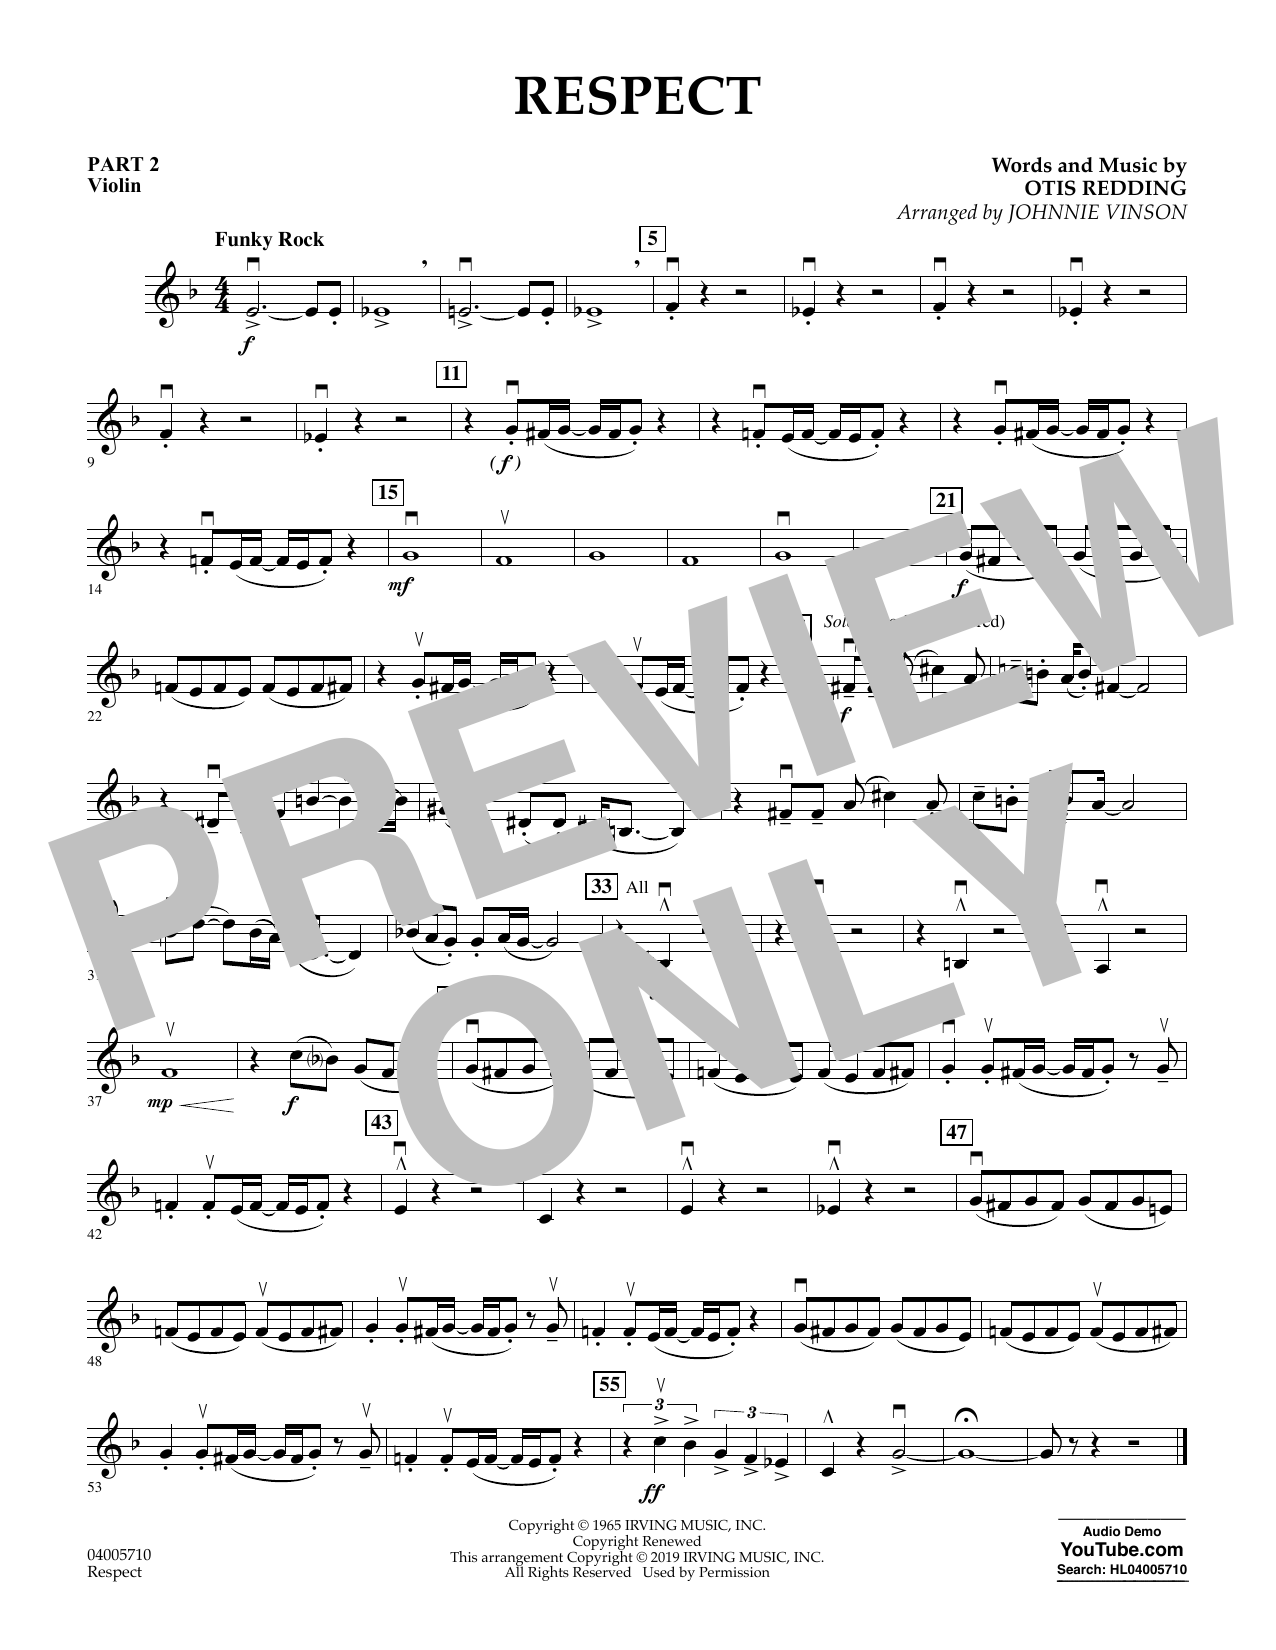 Respect (arr. Johnnie Vinson) - Pt.2 - Violin (Concert Band: Flex-Band)